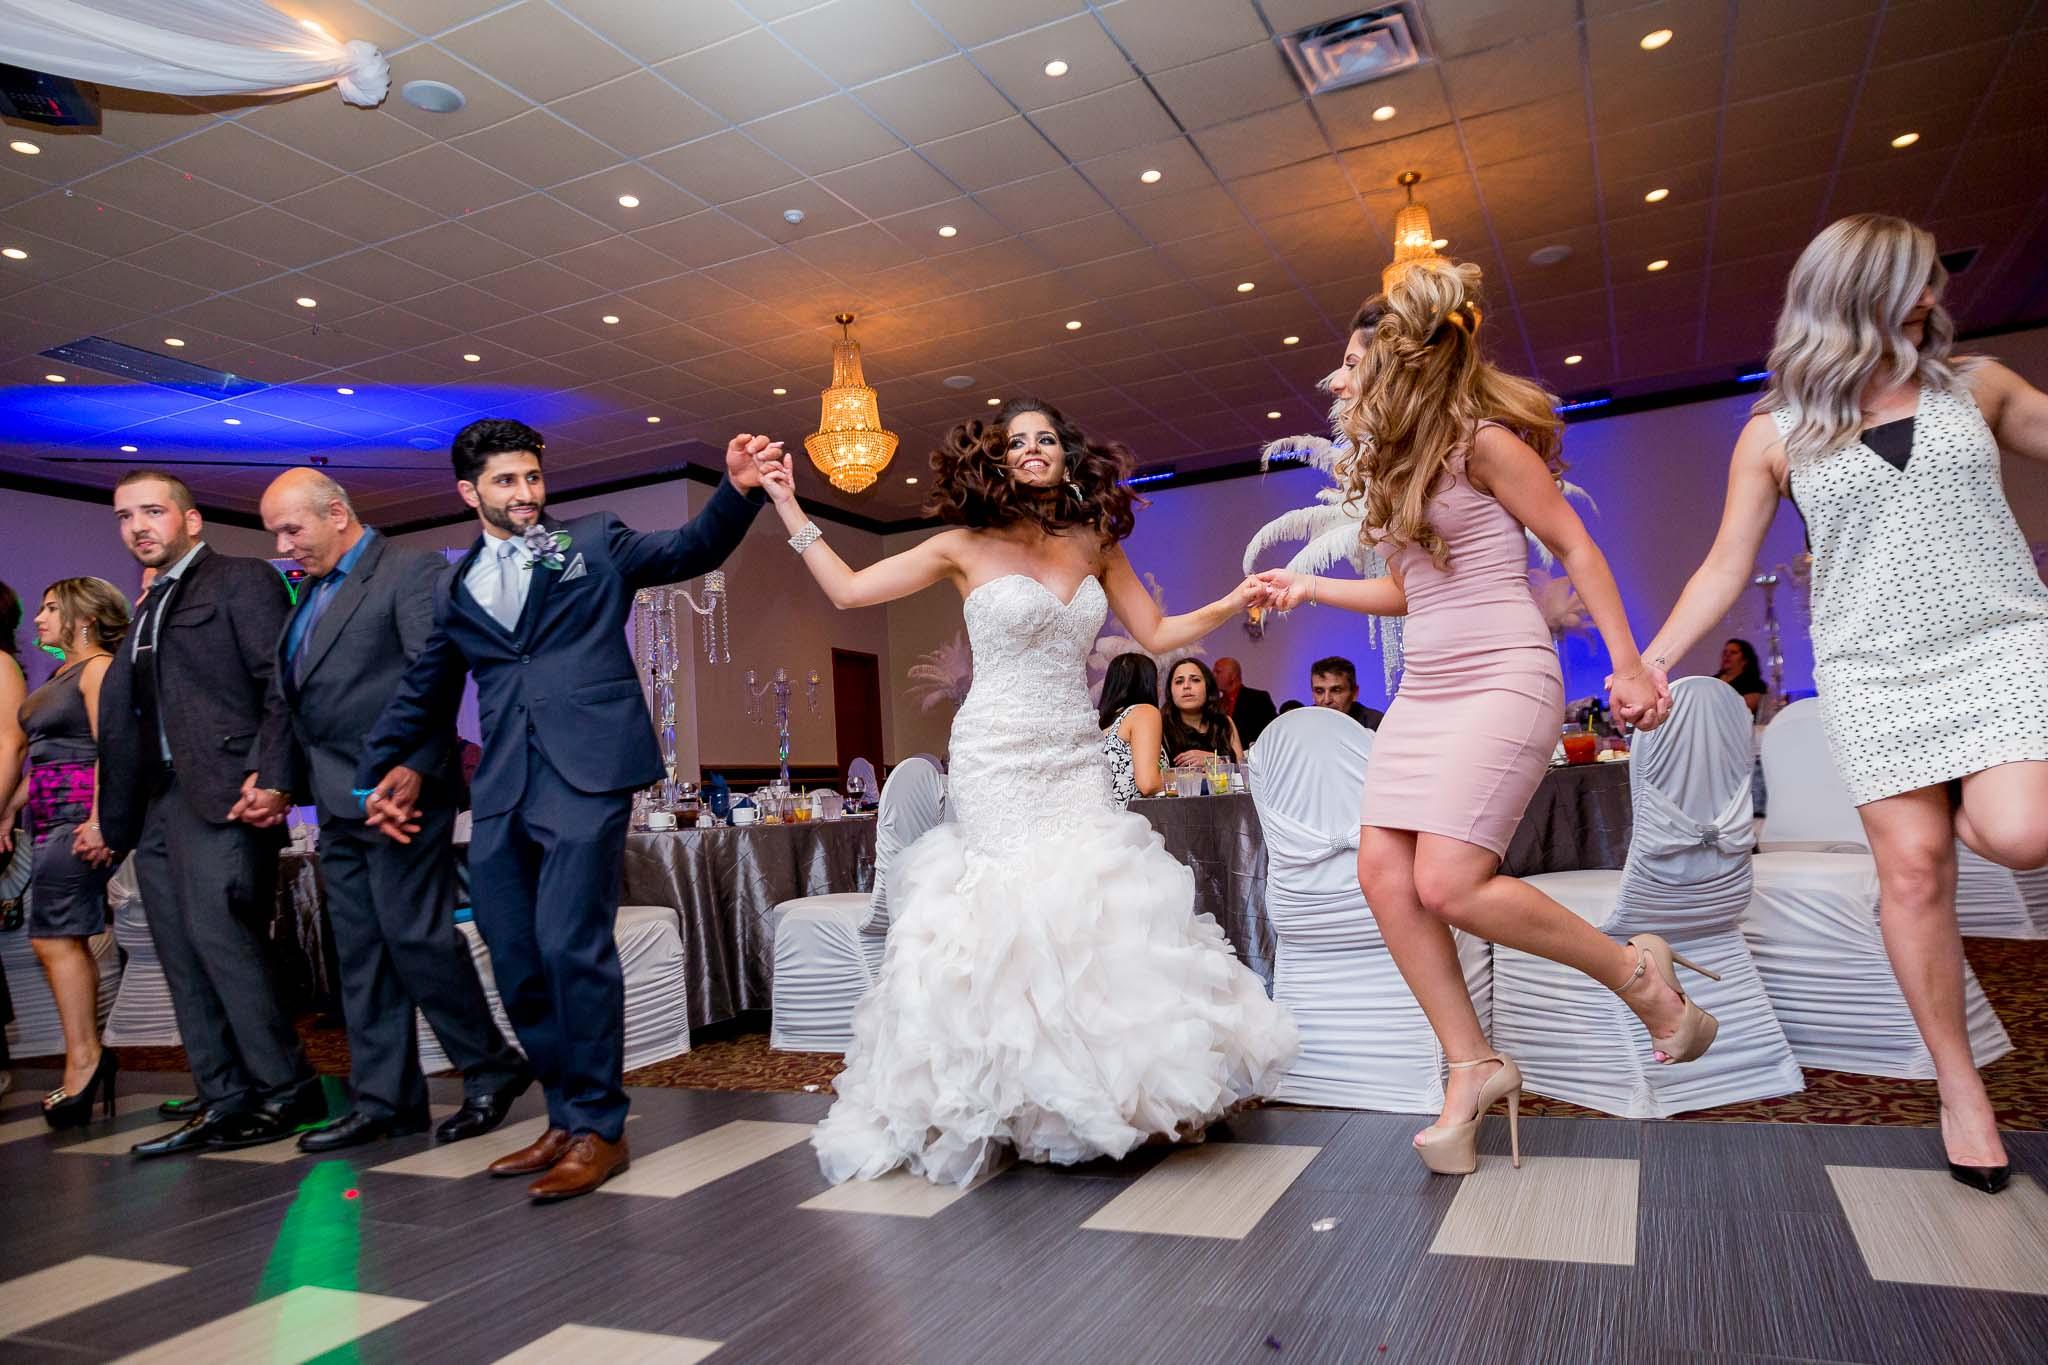 Dupka Wedding Dance Alberta Photos